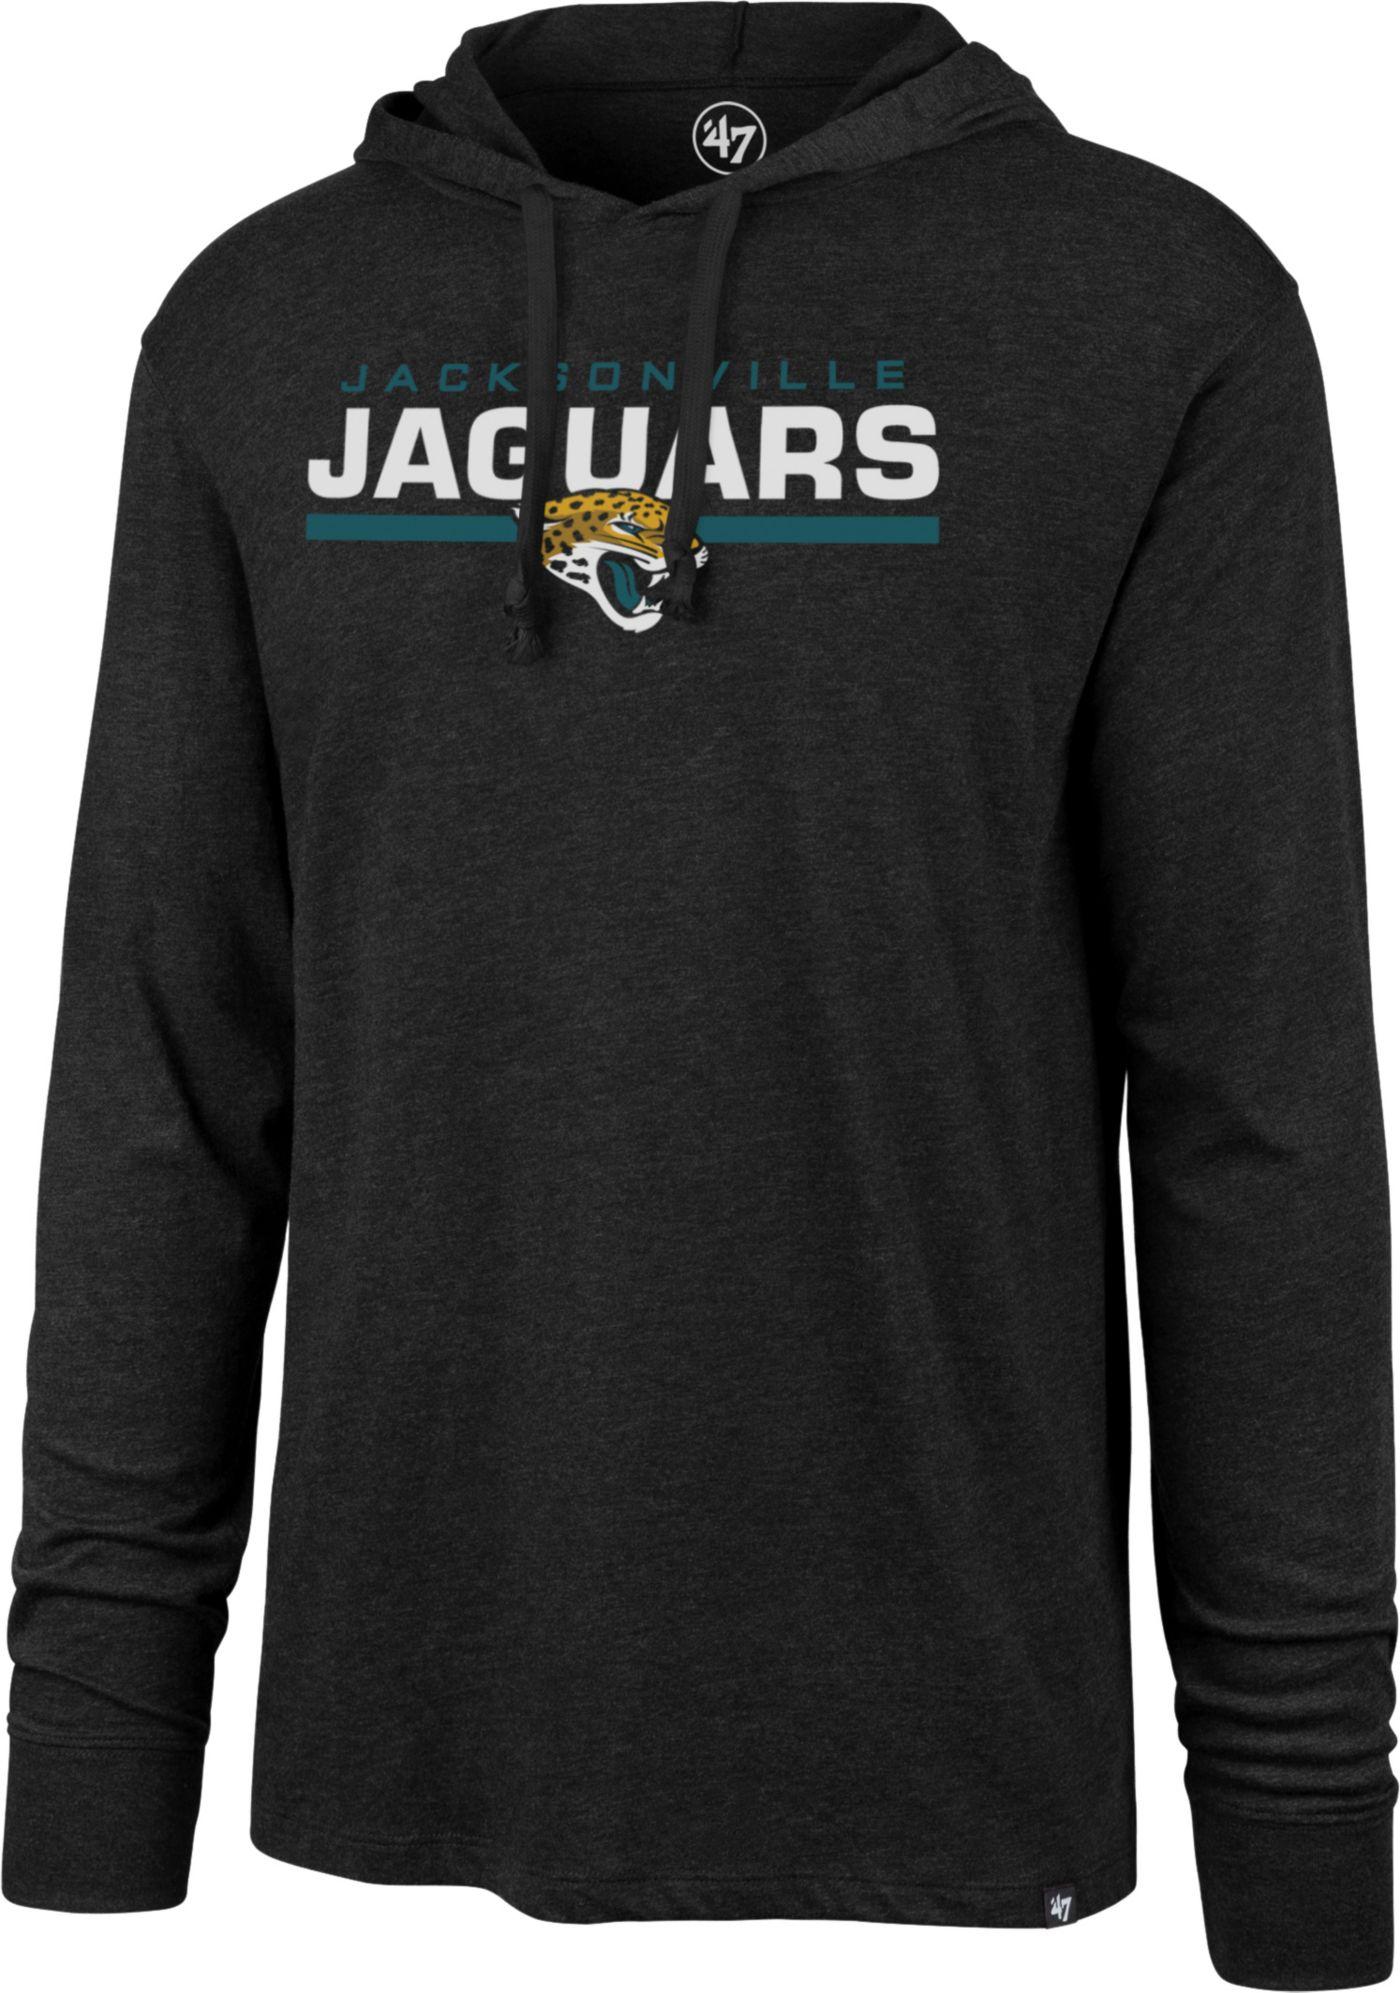 '47 Men's Jacksonville Jaguars Club Black Hooded Long Sleeve Shirt